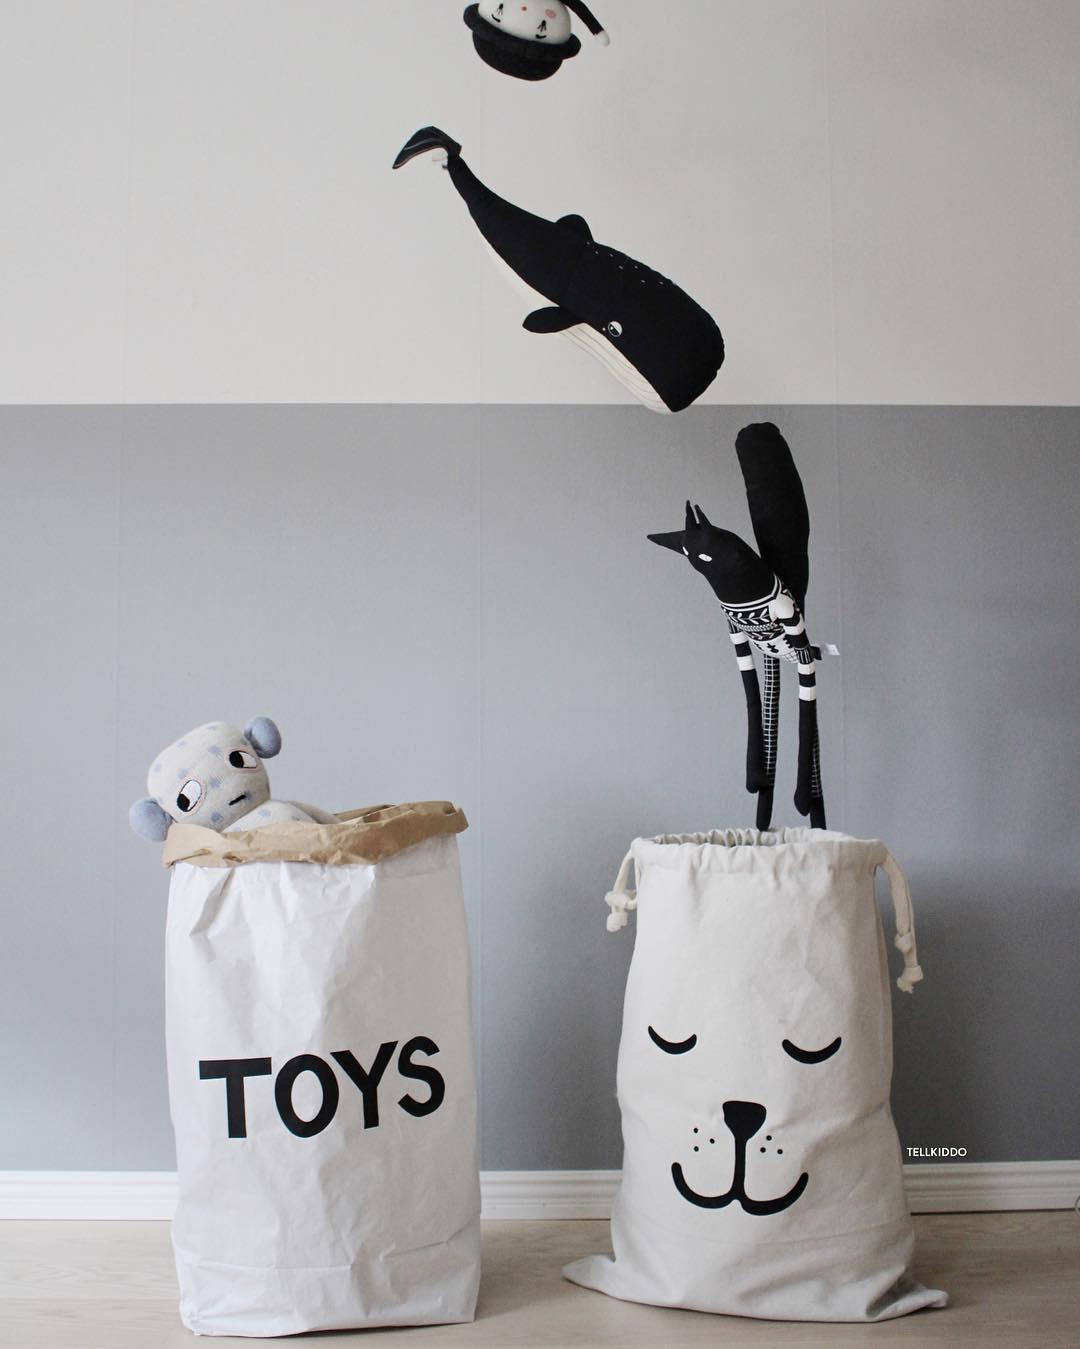 Tellkiddo 瑞典可愛圖案牛皮紙收納袋 Toys2